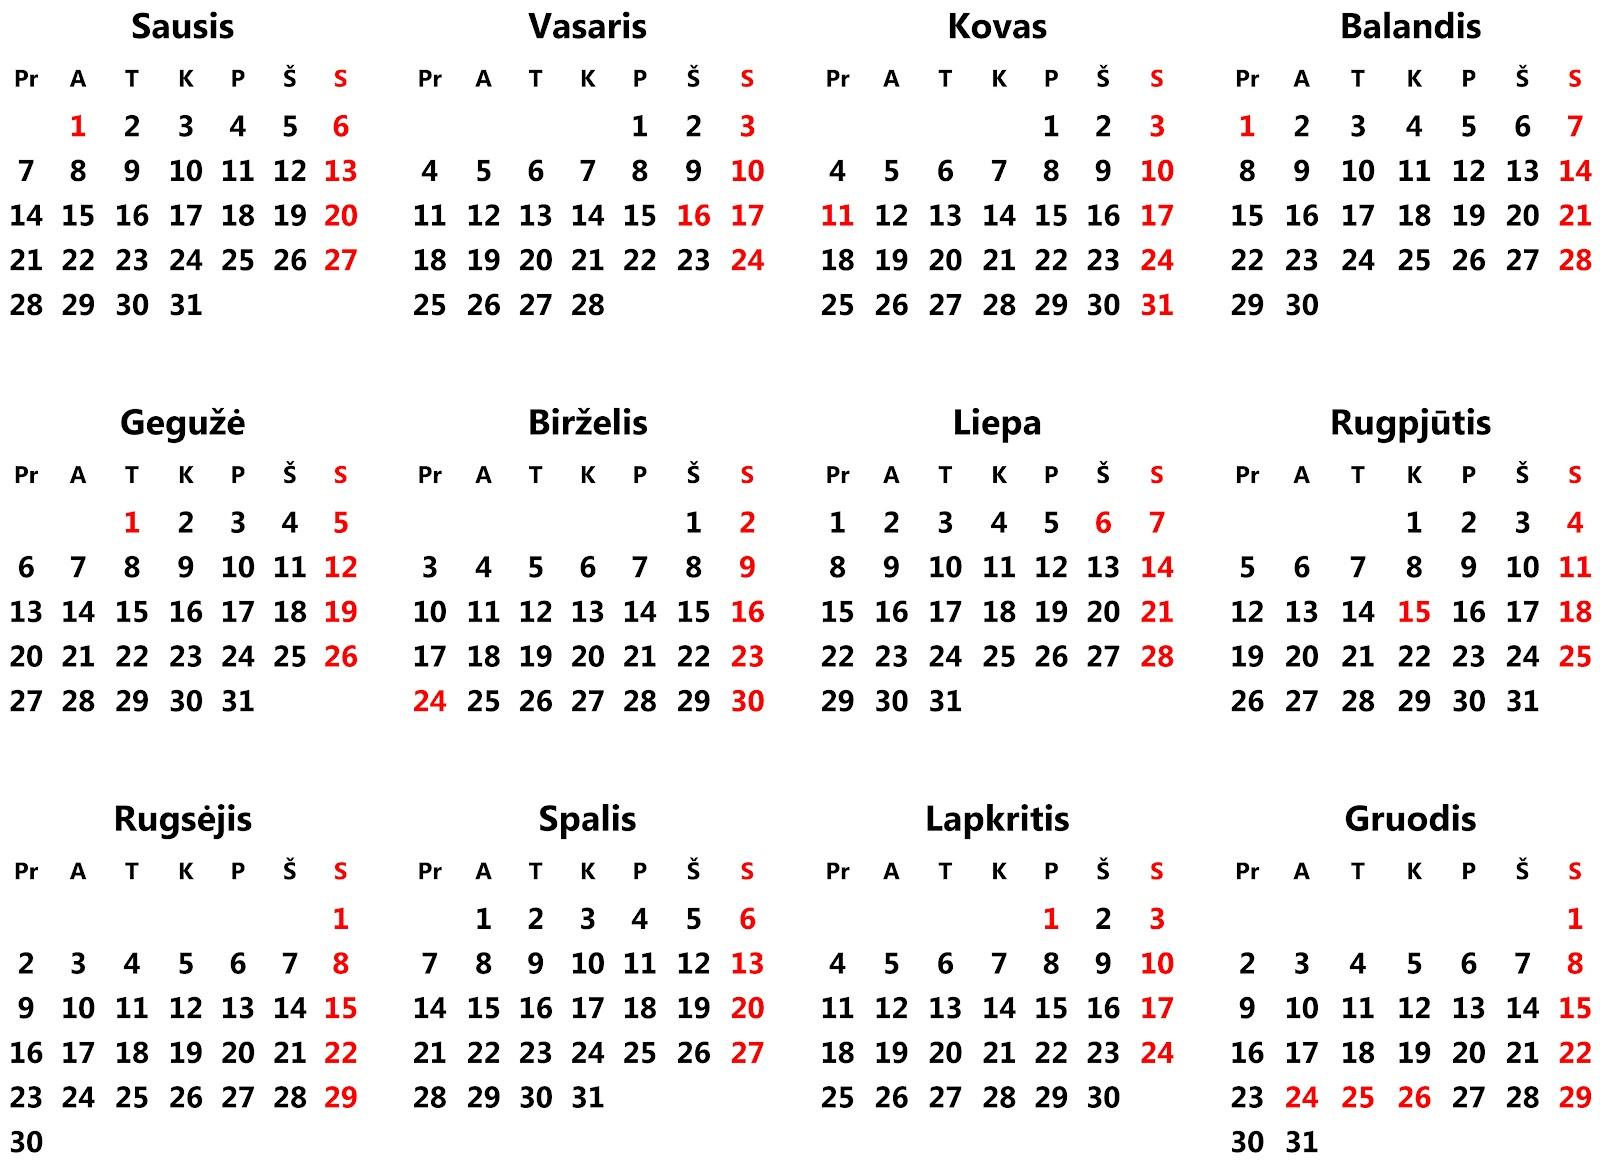 2020 Darbo Kalendorius.2013 M Finansinis Kalendorius Treatrijifti Ga